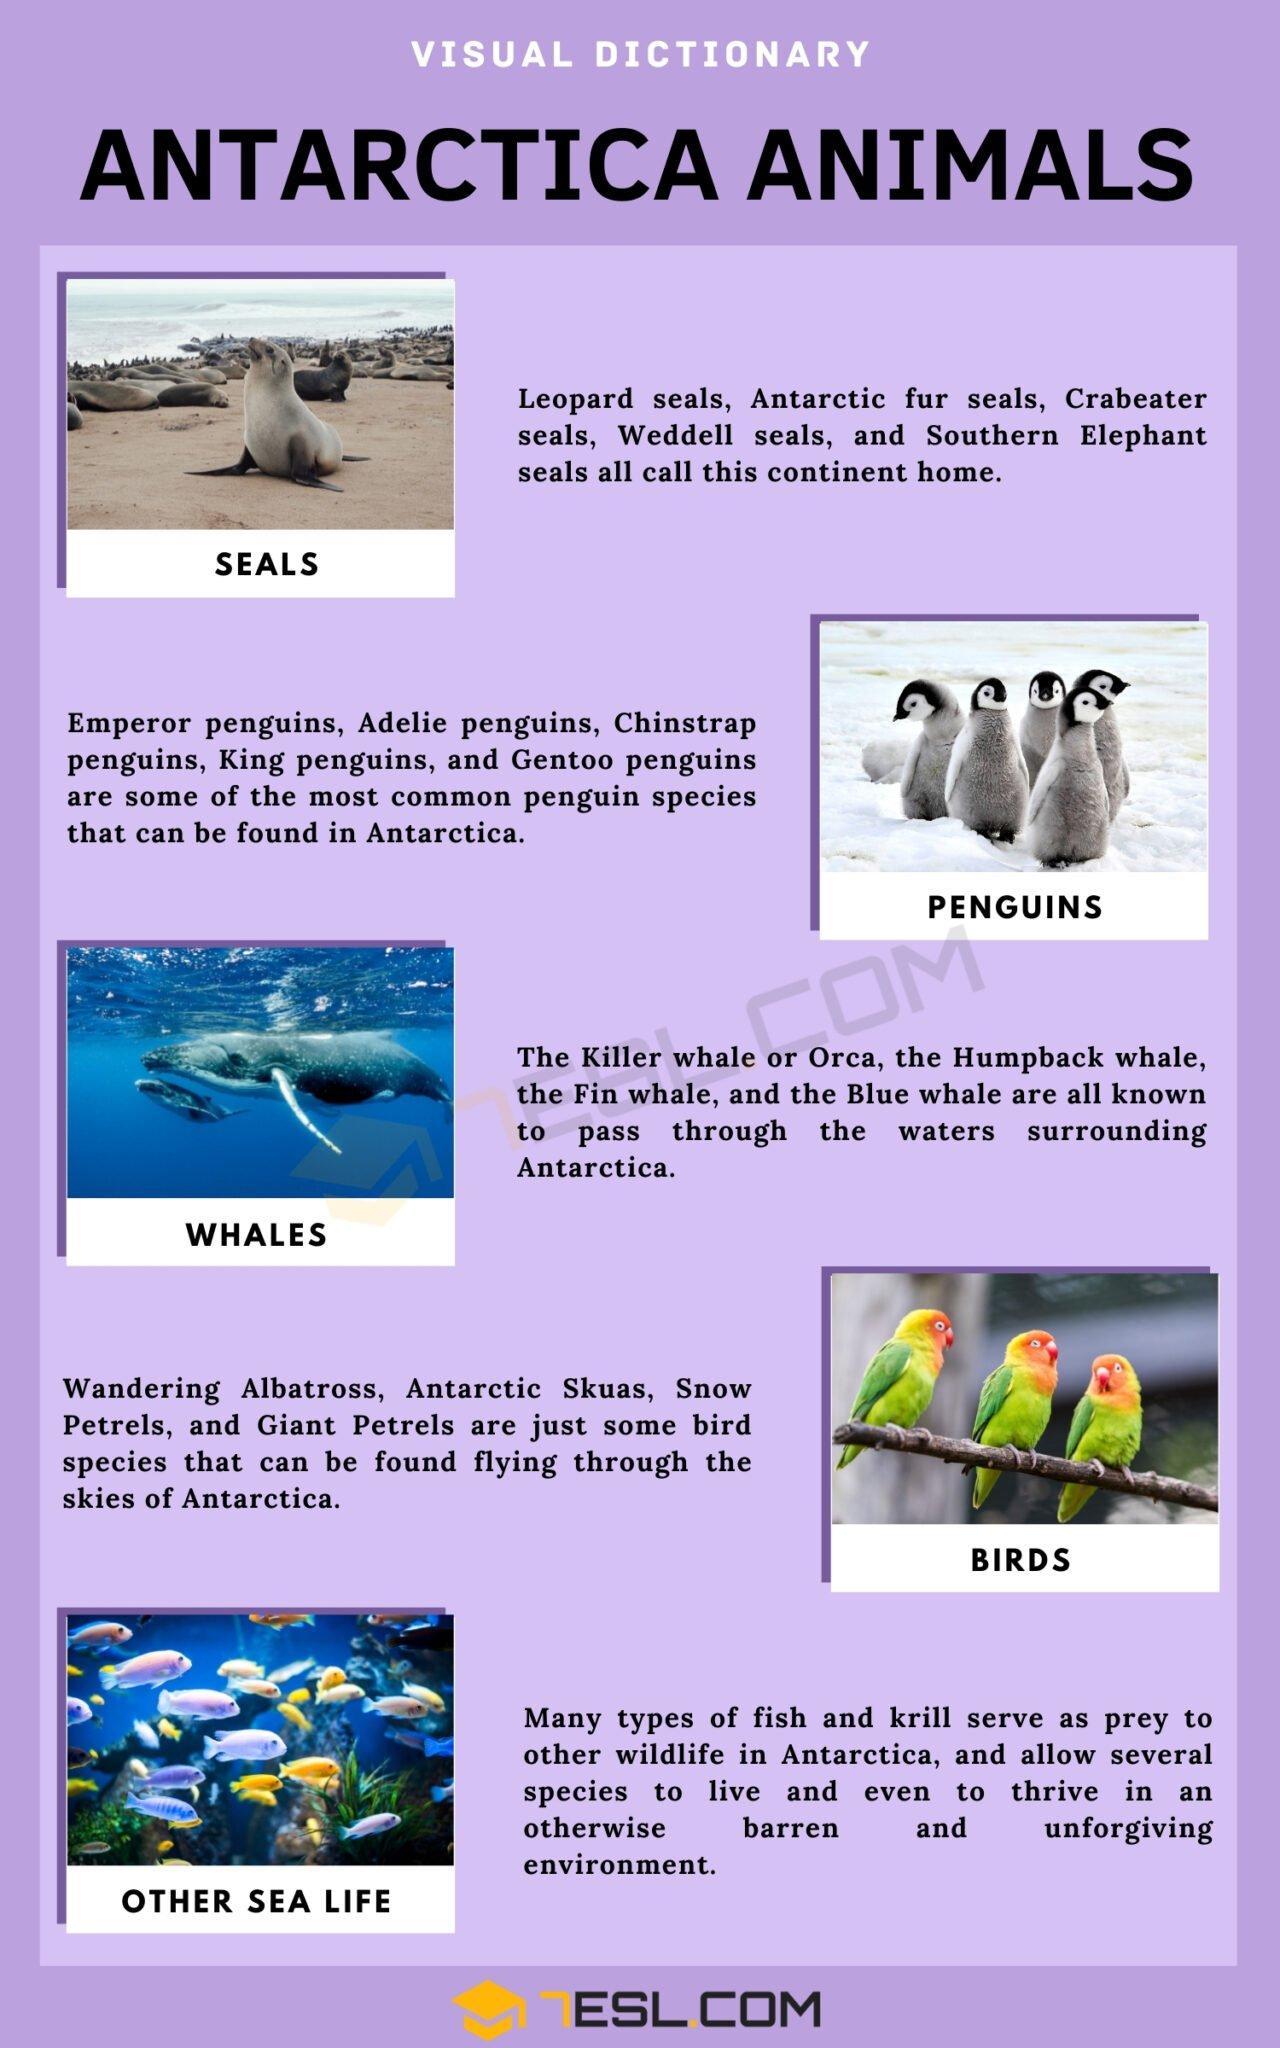 Antarctica Animals | List of Interesting Animals That Live In Antarctica